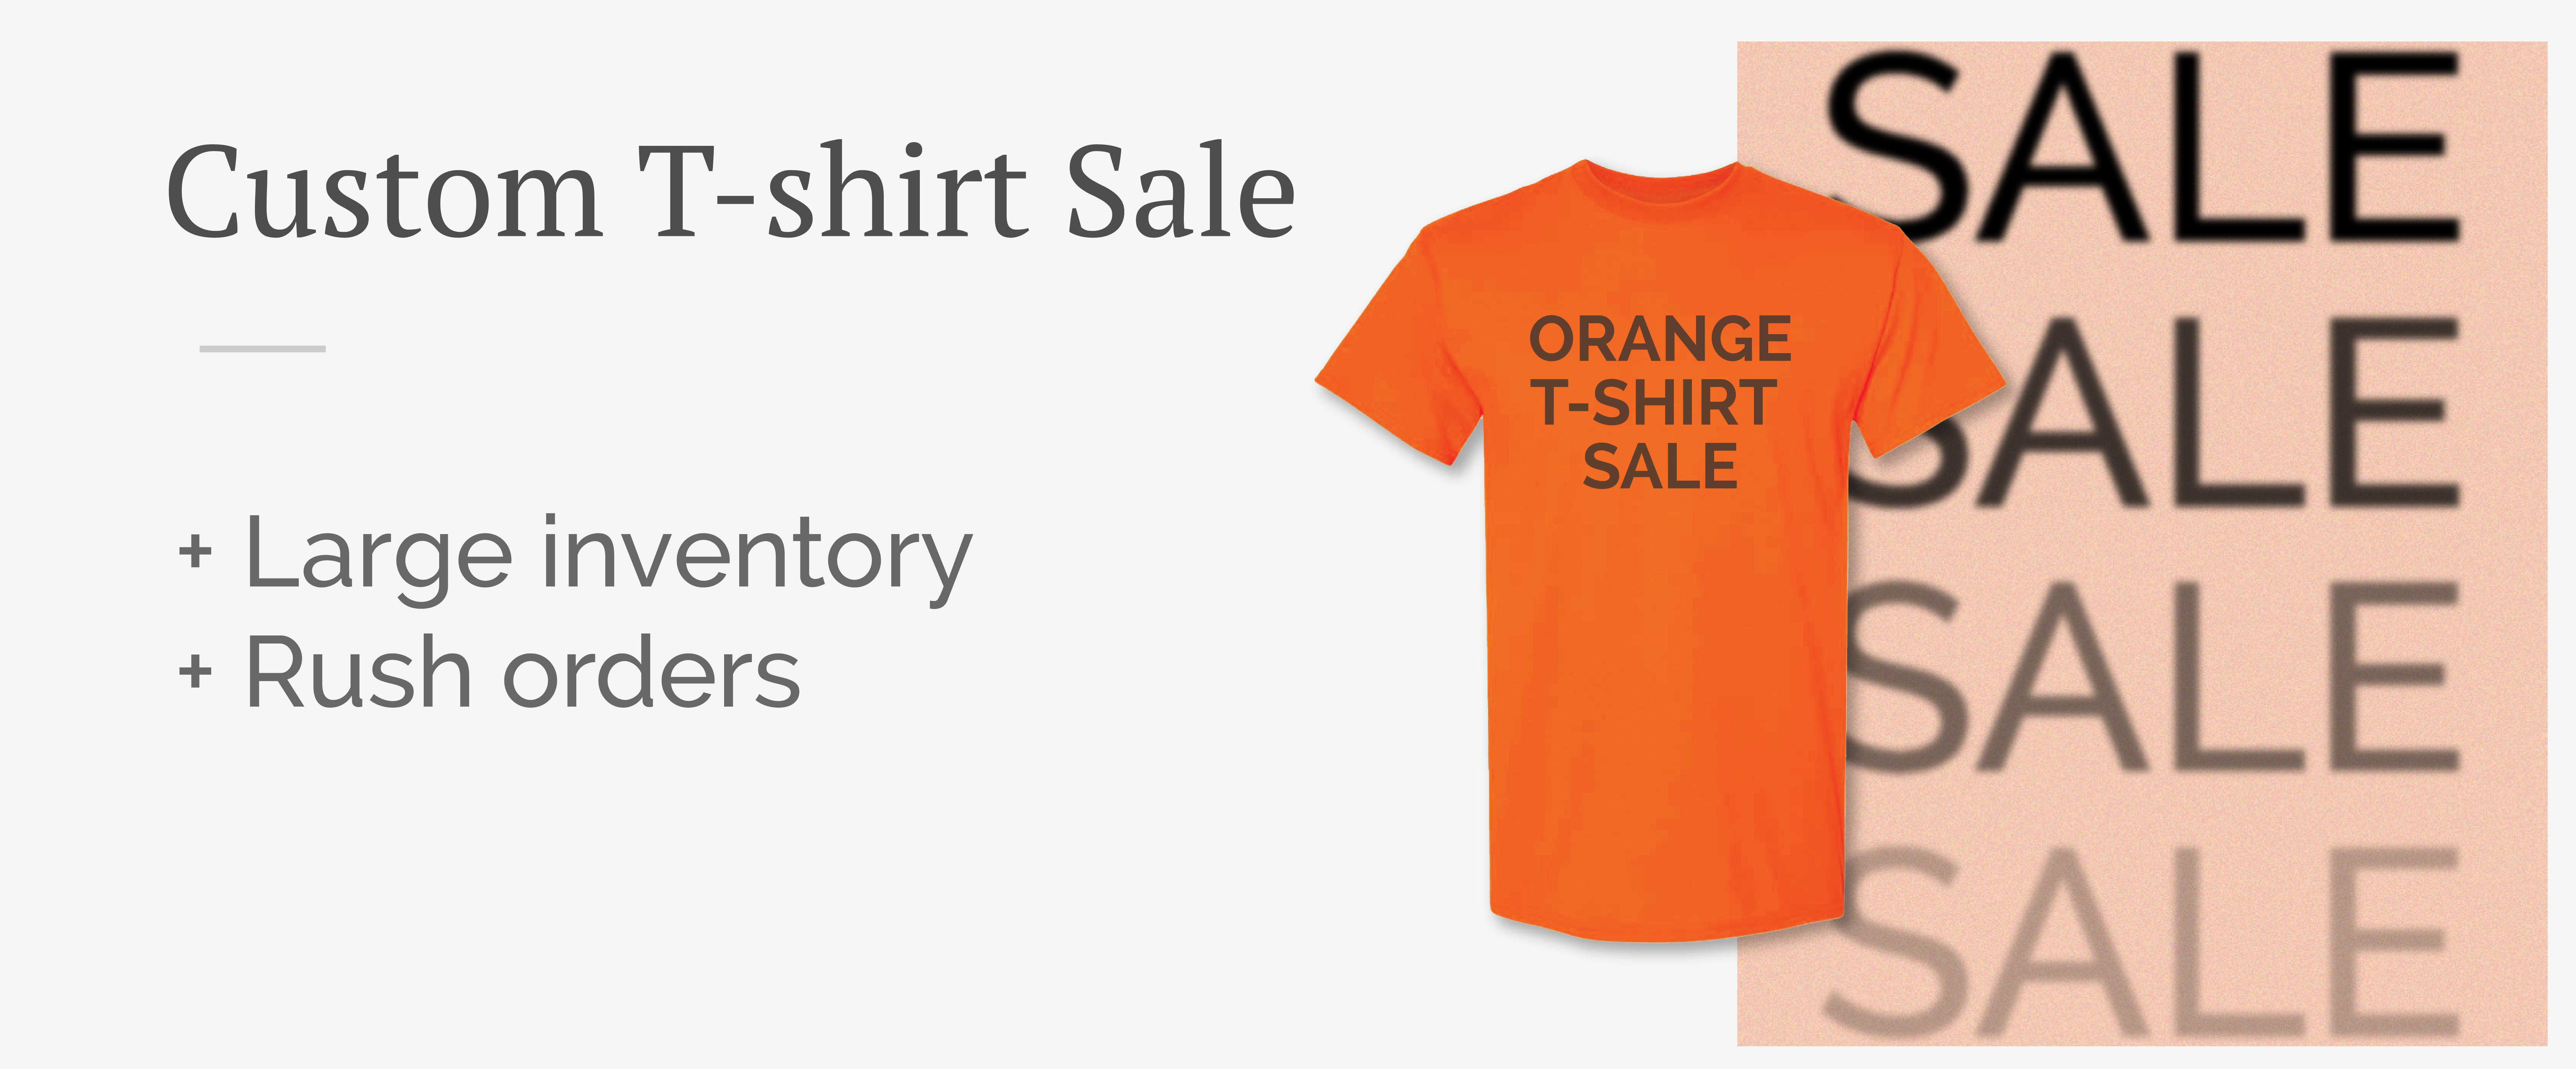 Orange T-shirt Sale